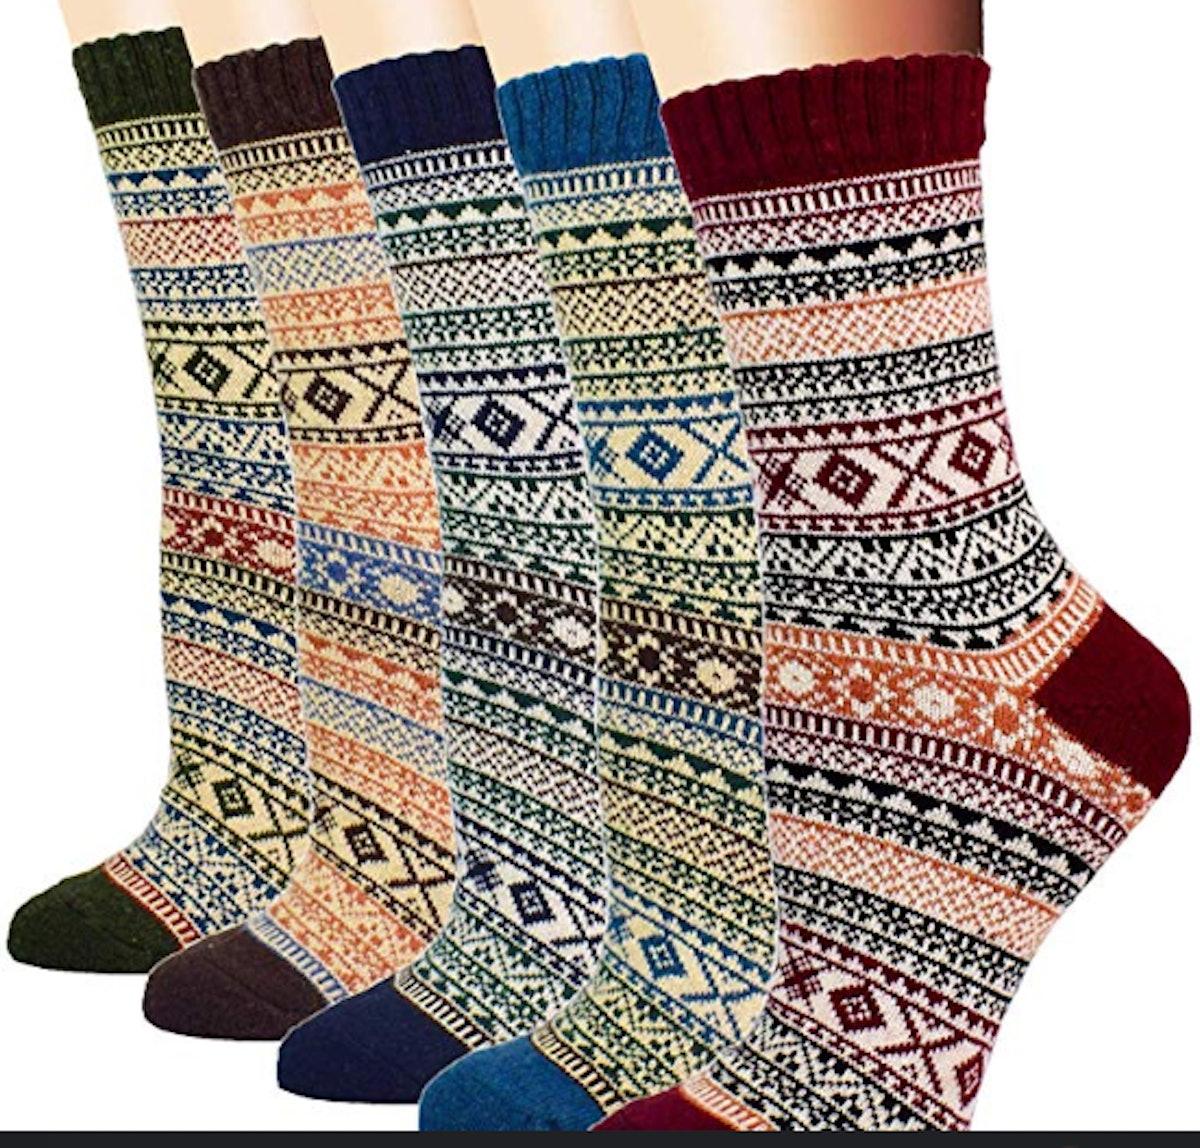 YZKKE Vintage Knit Socks (5-Pack)